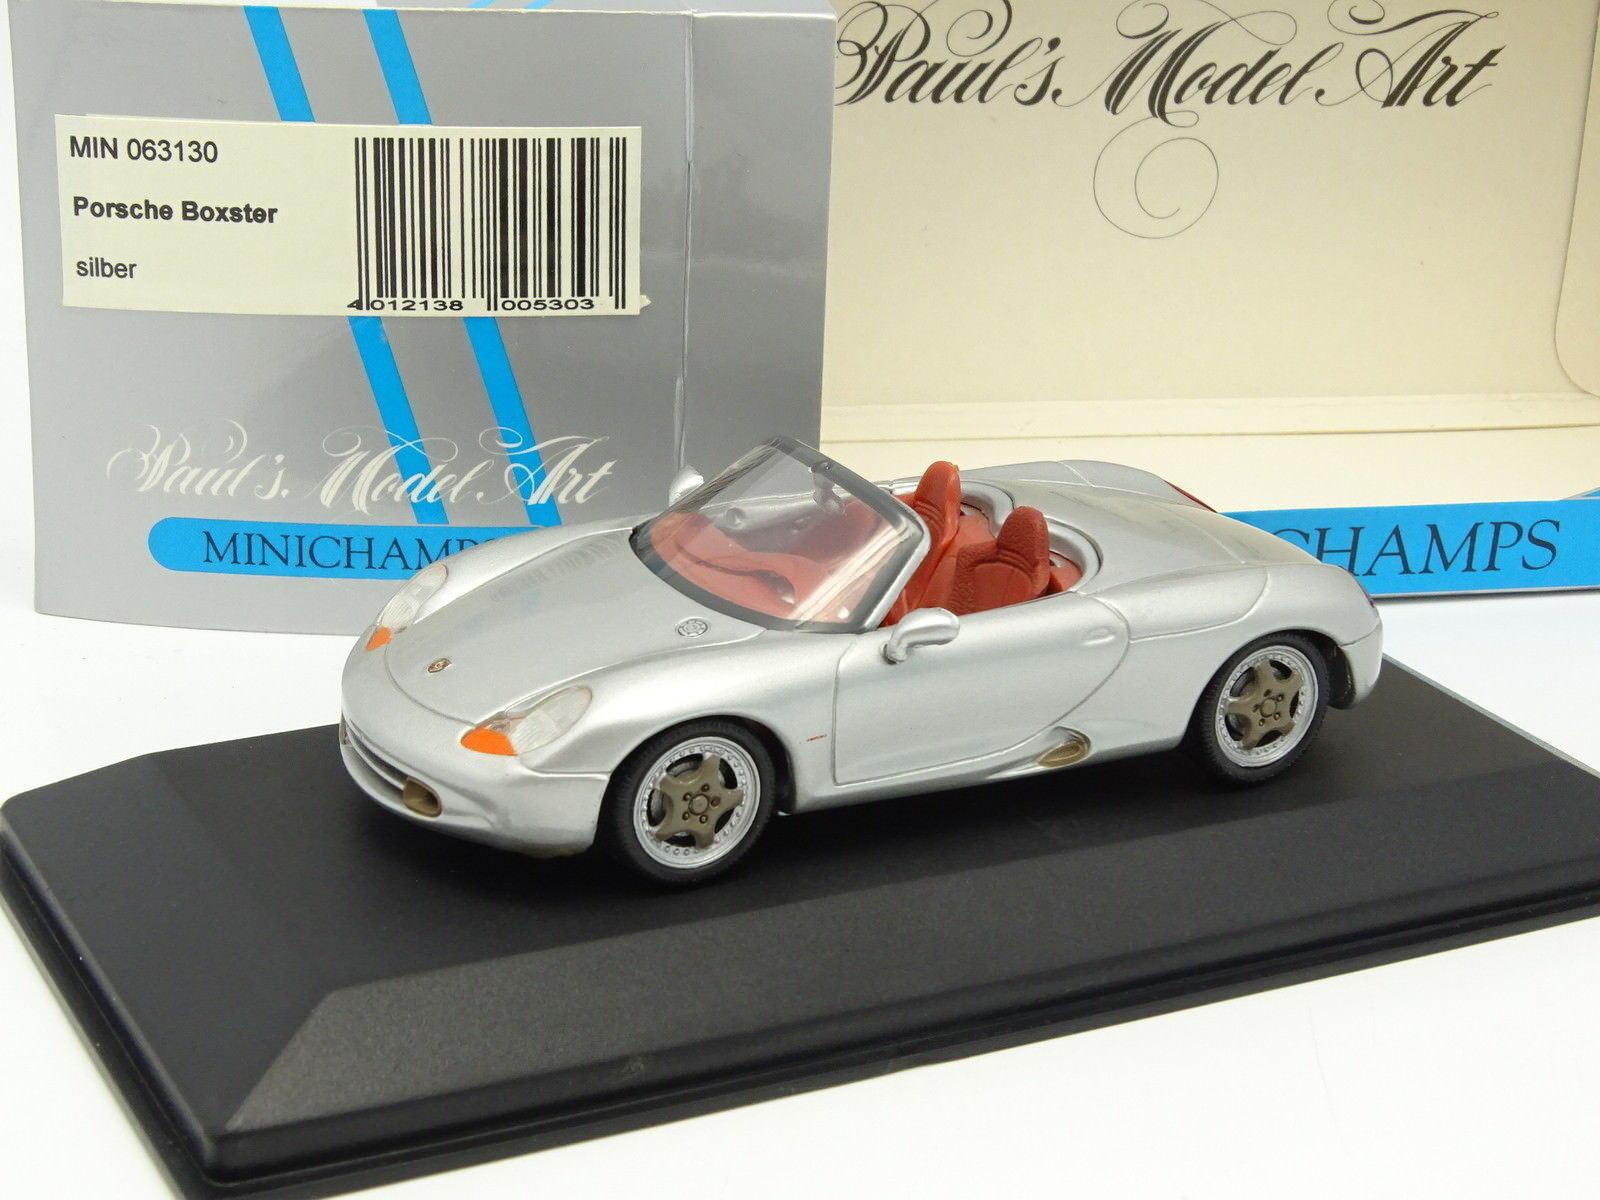 Minichamps 1 43 - Porsche Boxster Concept silver